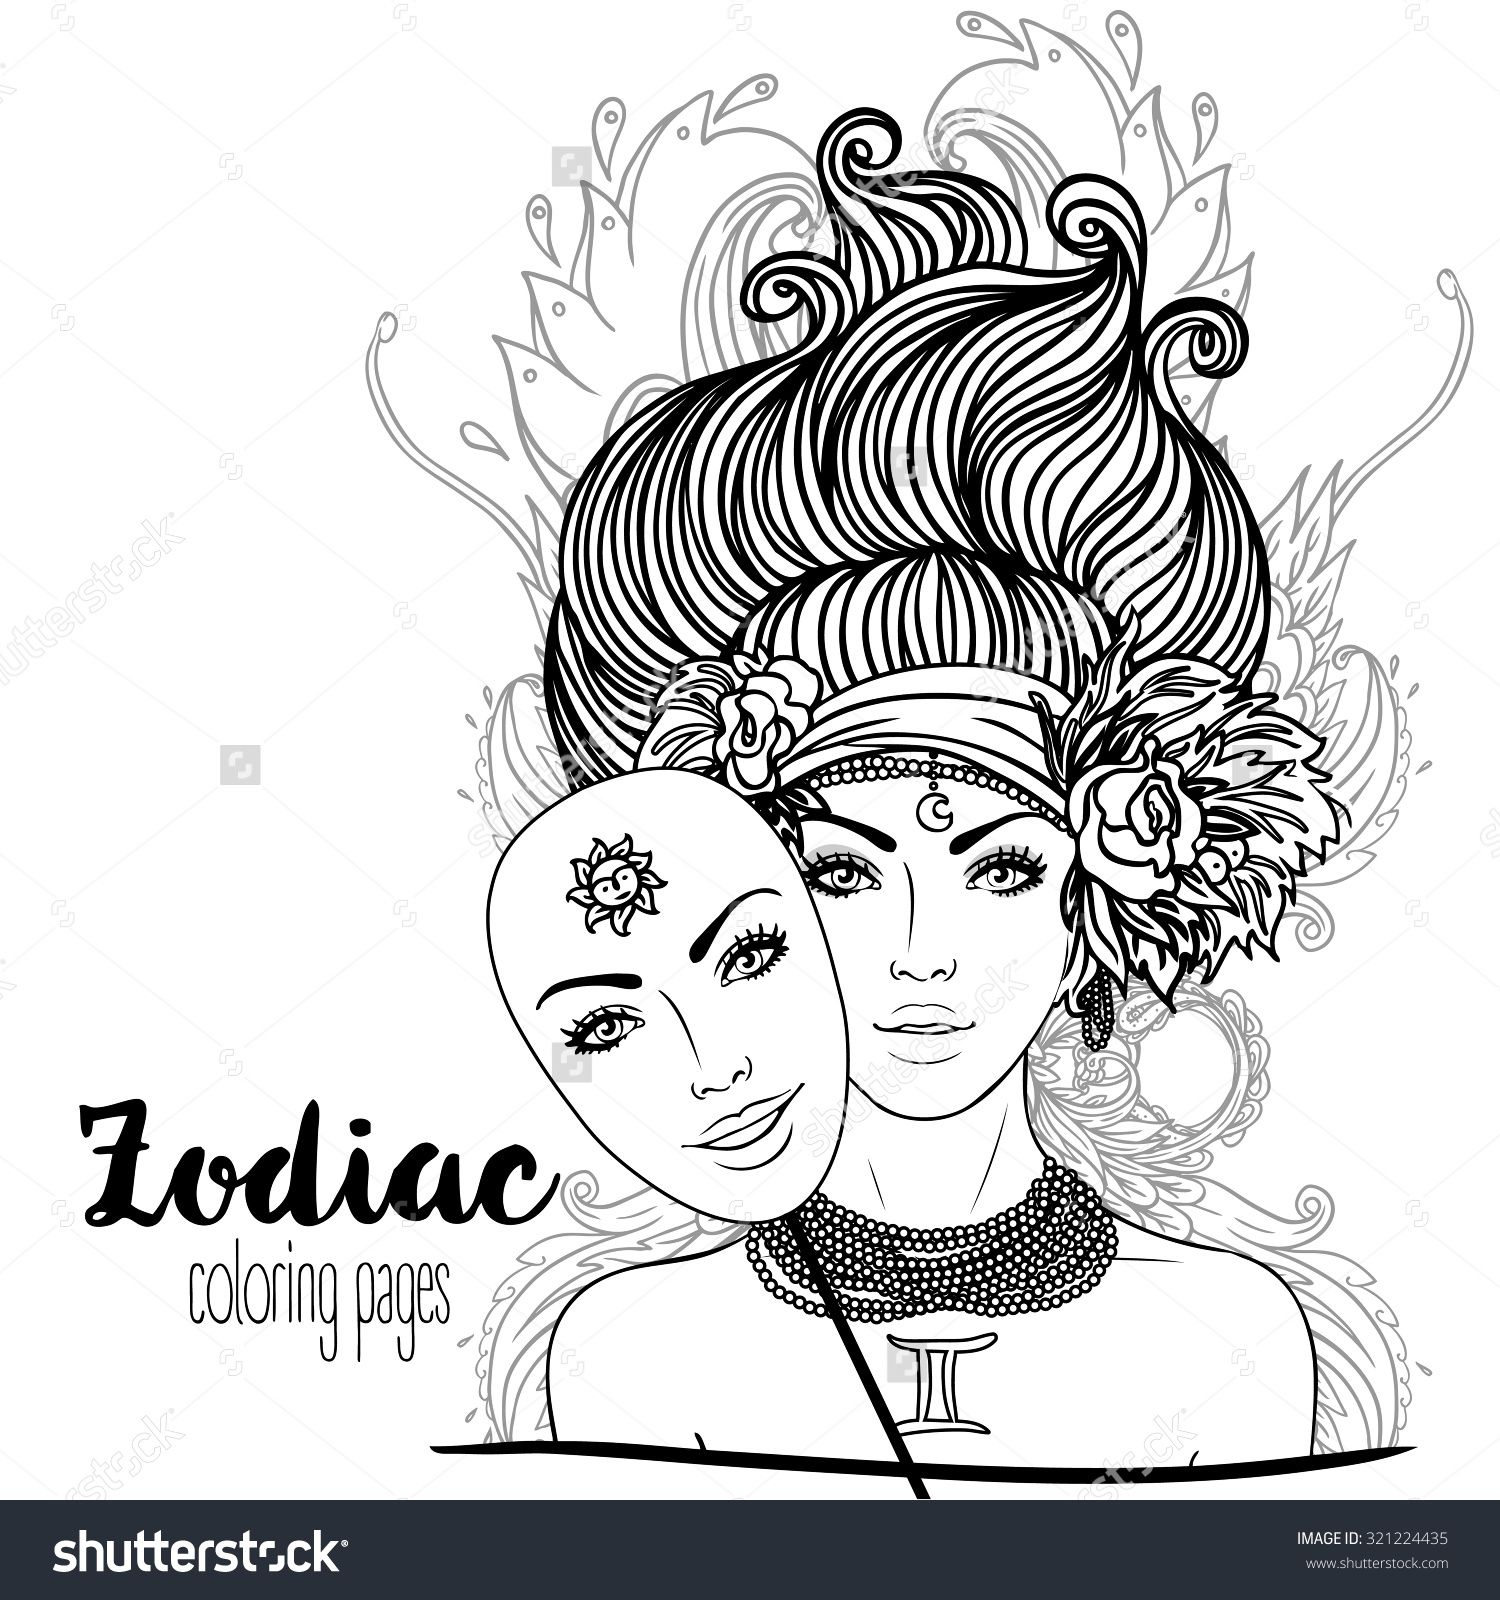 Zodiac Illustration Of Gemini Zodiac Sign As A Beautiful Girl